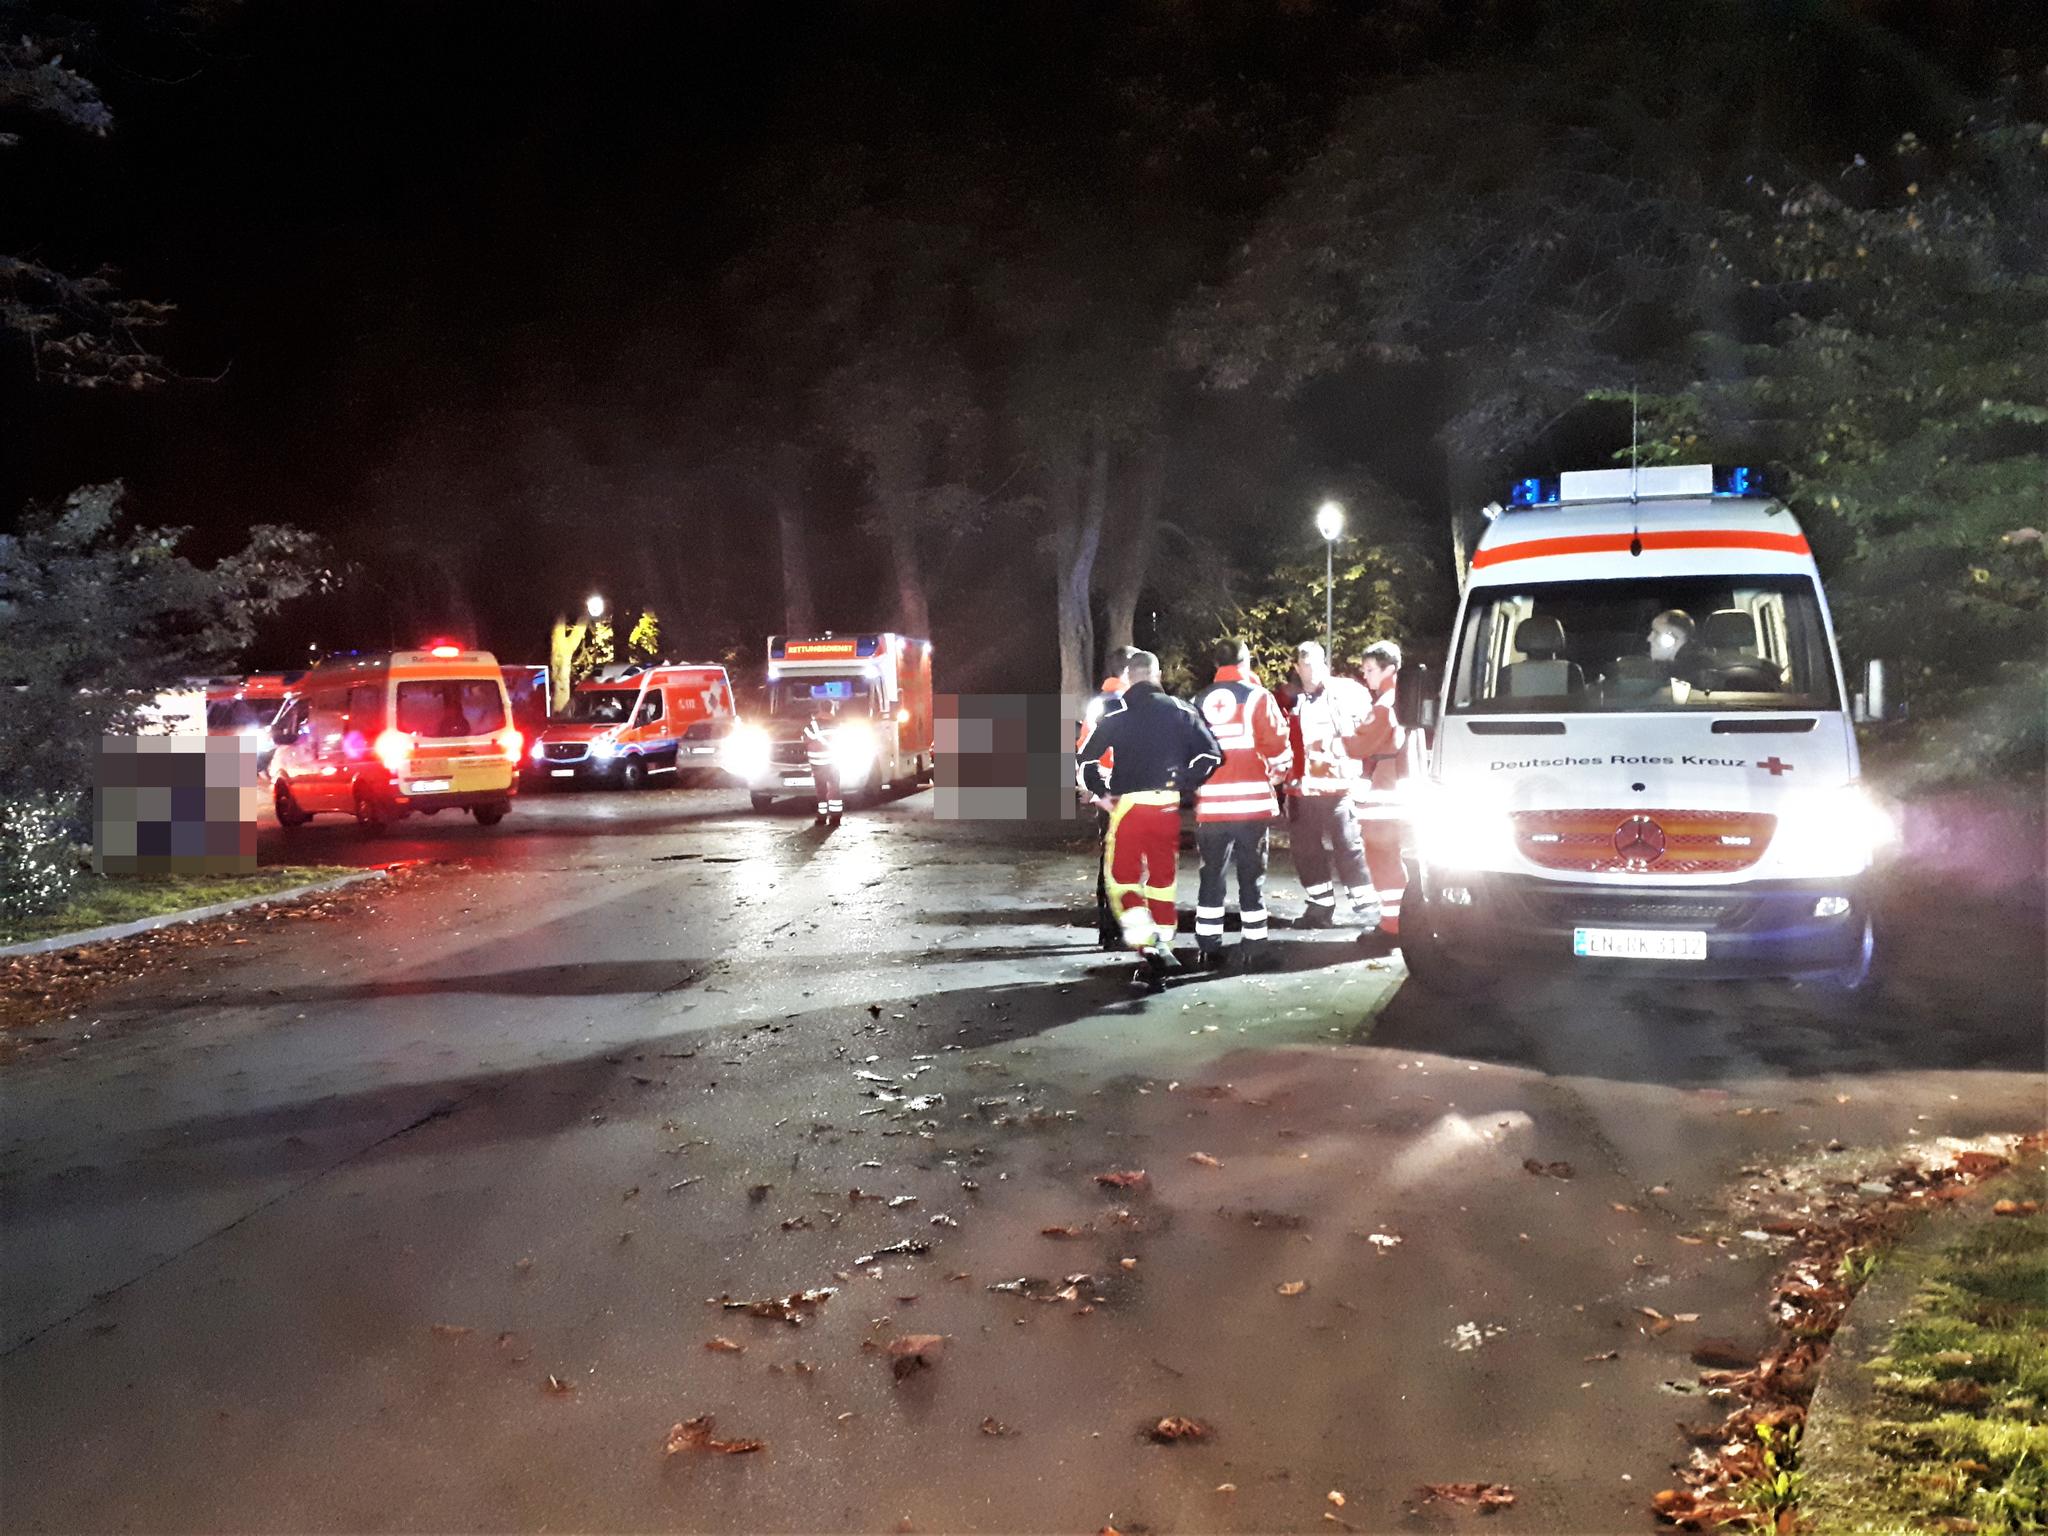 Swingerclub evakuiert